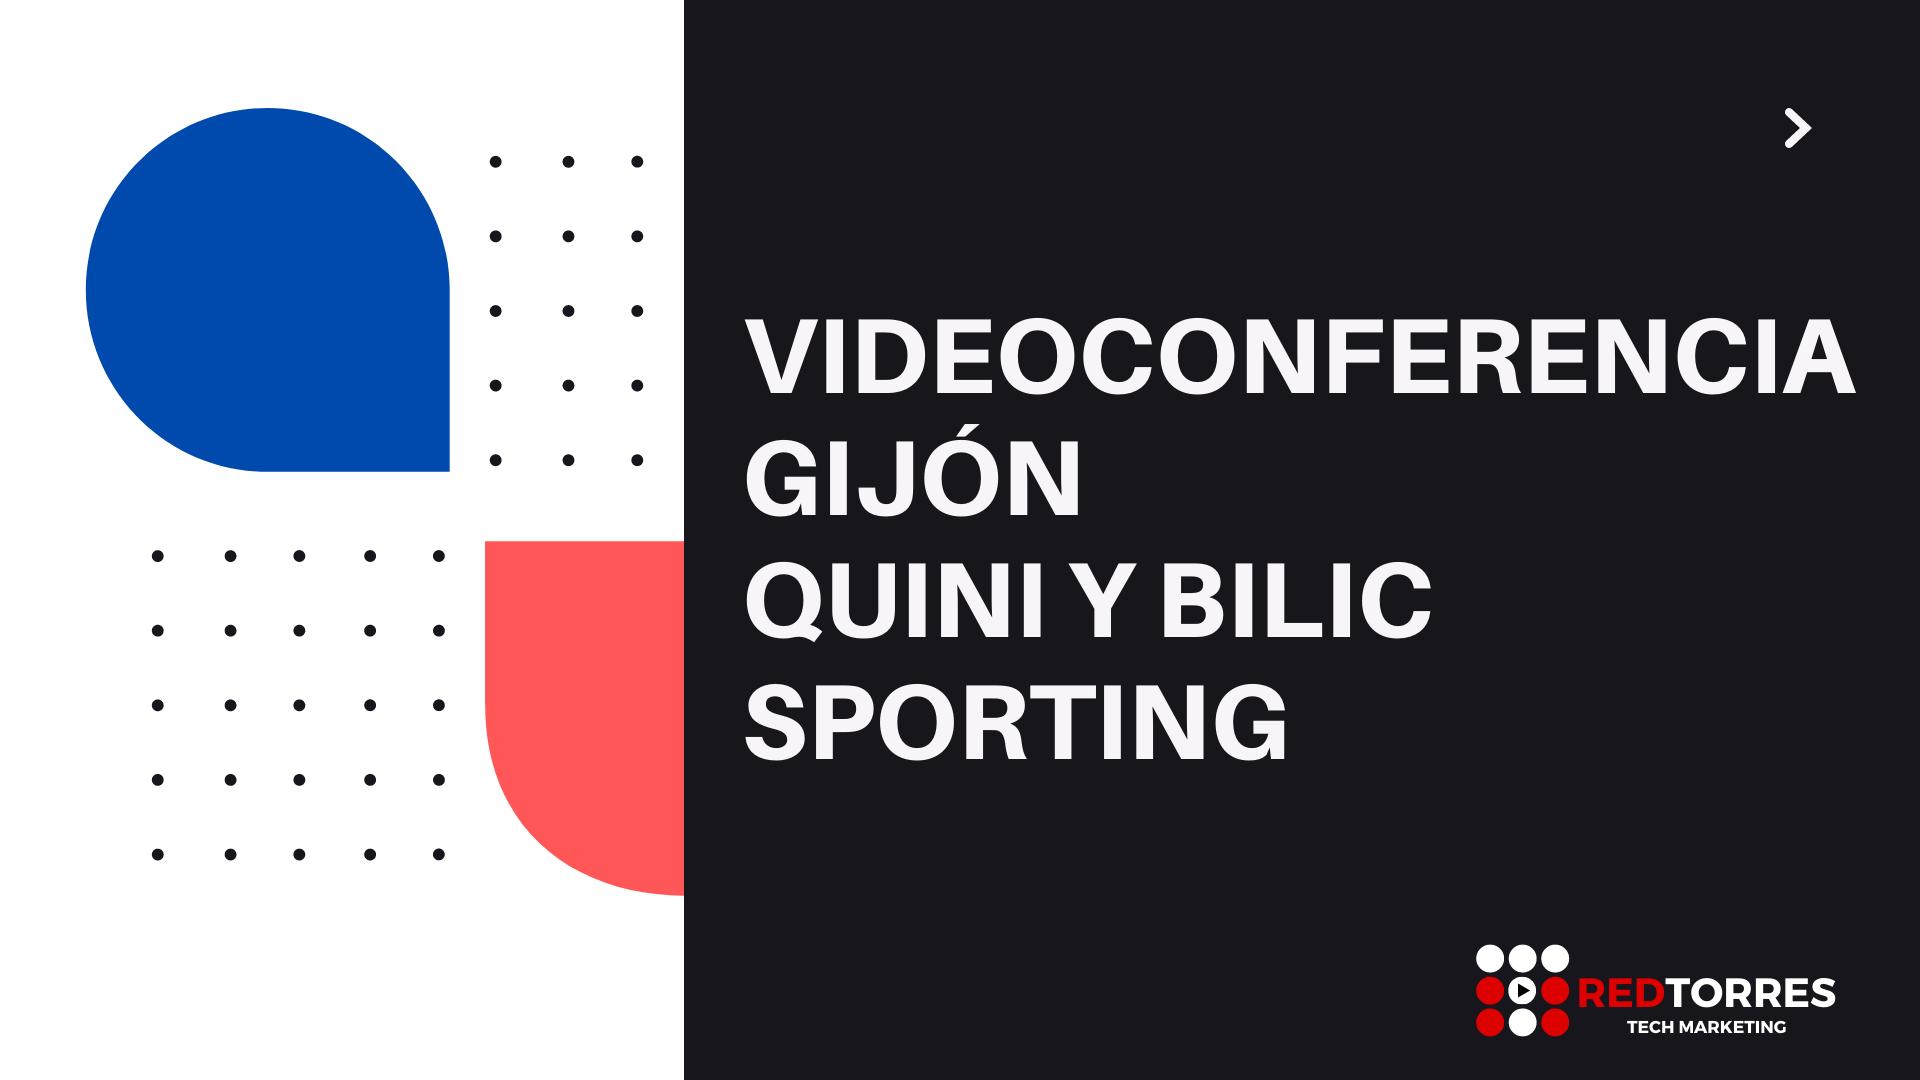 Videoconferencia Gijón con Quini & Bilic del Sporting | REDTORRES